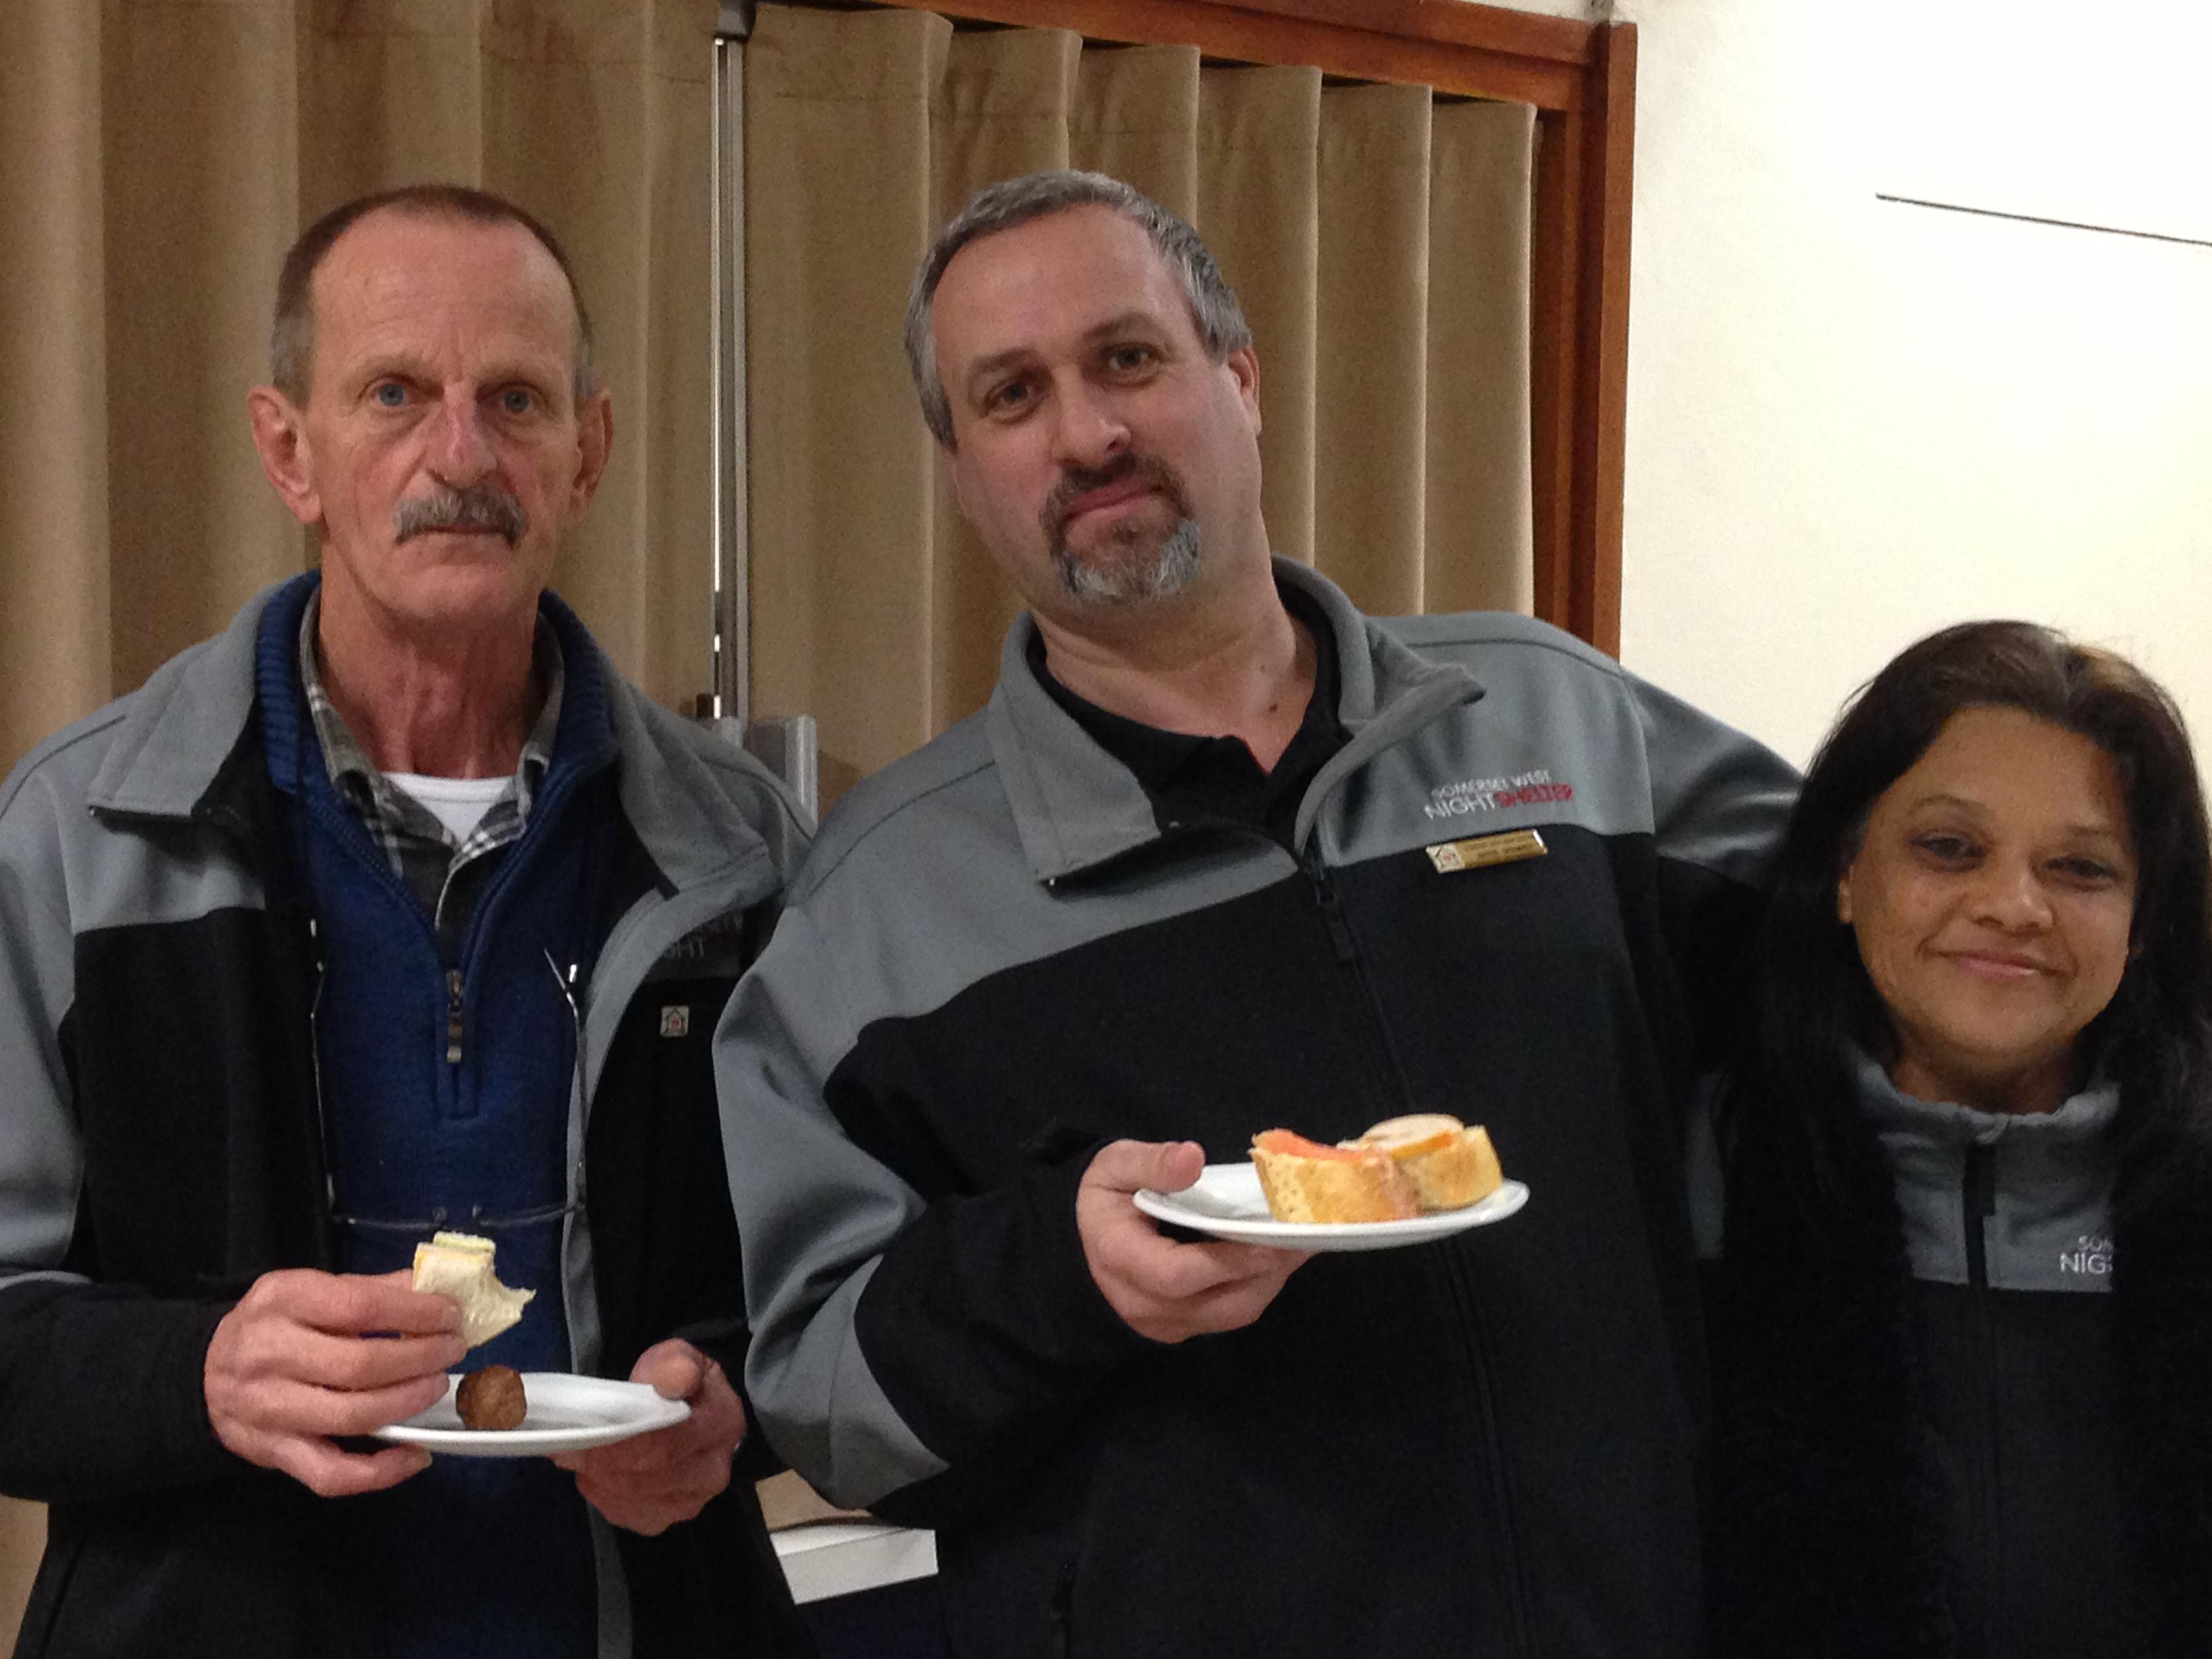 Shelter AGM - Nicolas Van Rooyen, Wayne Spammer & Nazleah Simmons